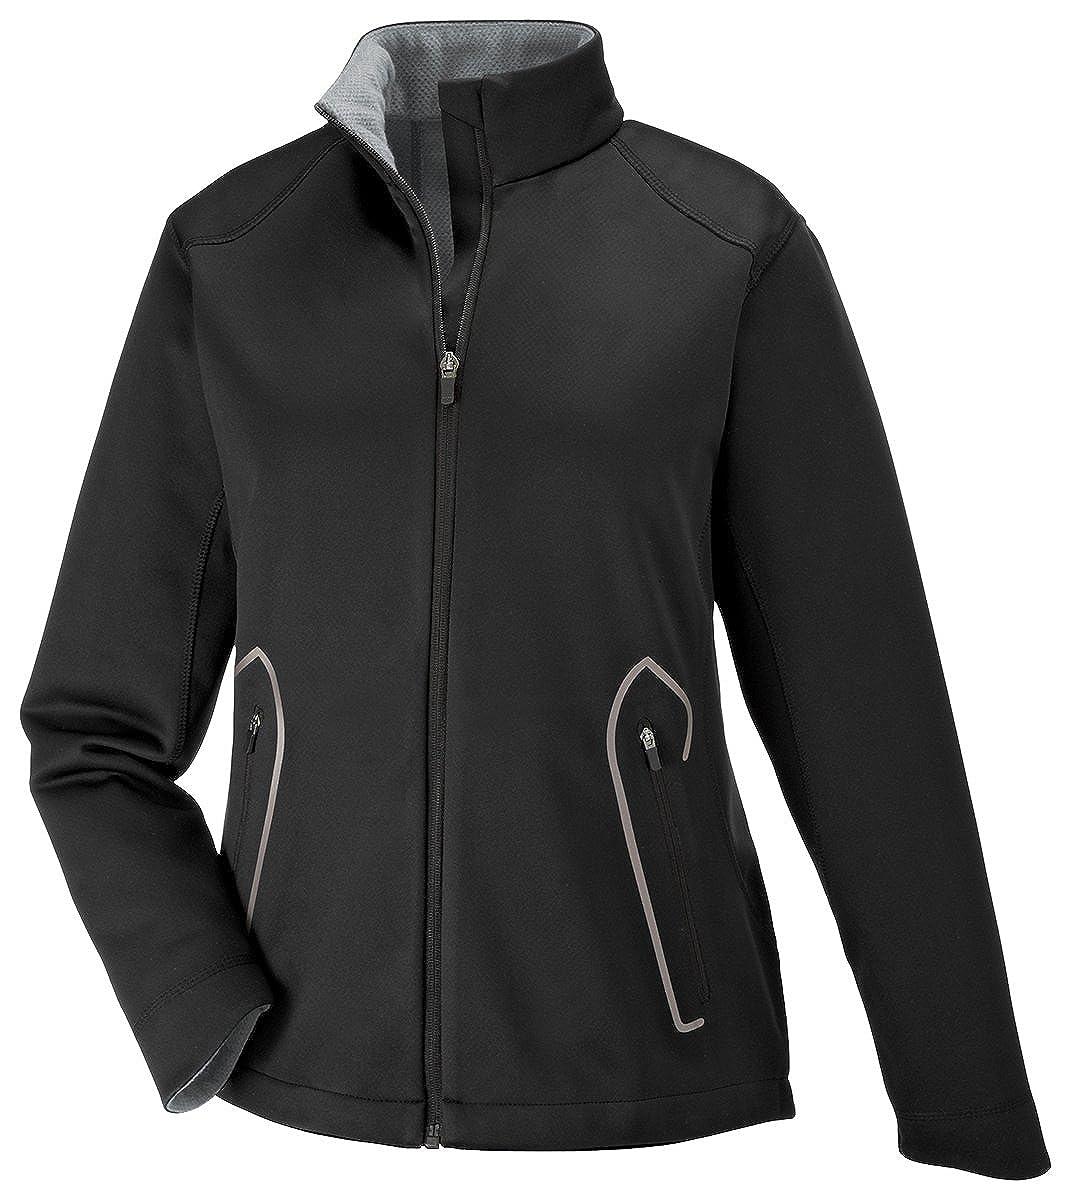 Splice Ladies Light Bonded Soft Shell Jacket With Laser Welding XL Black